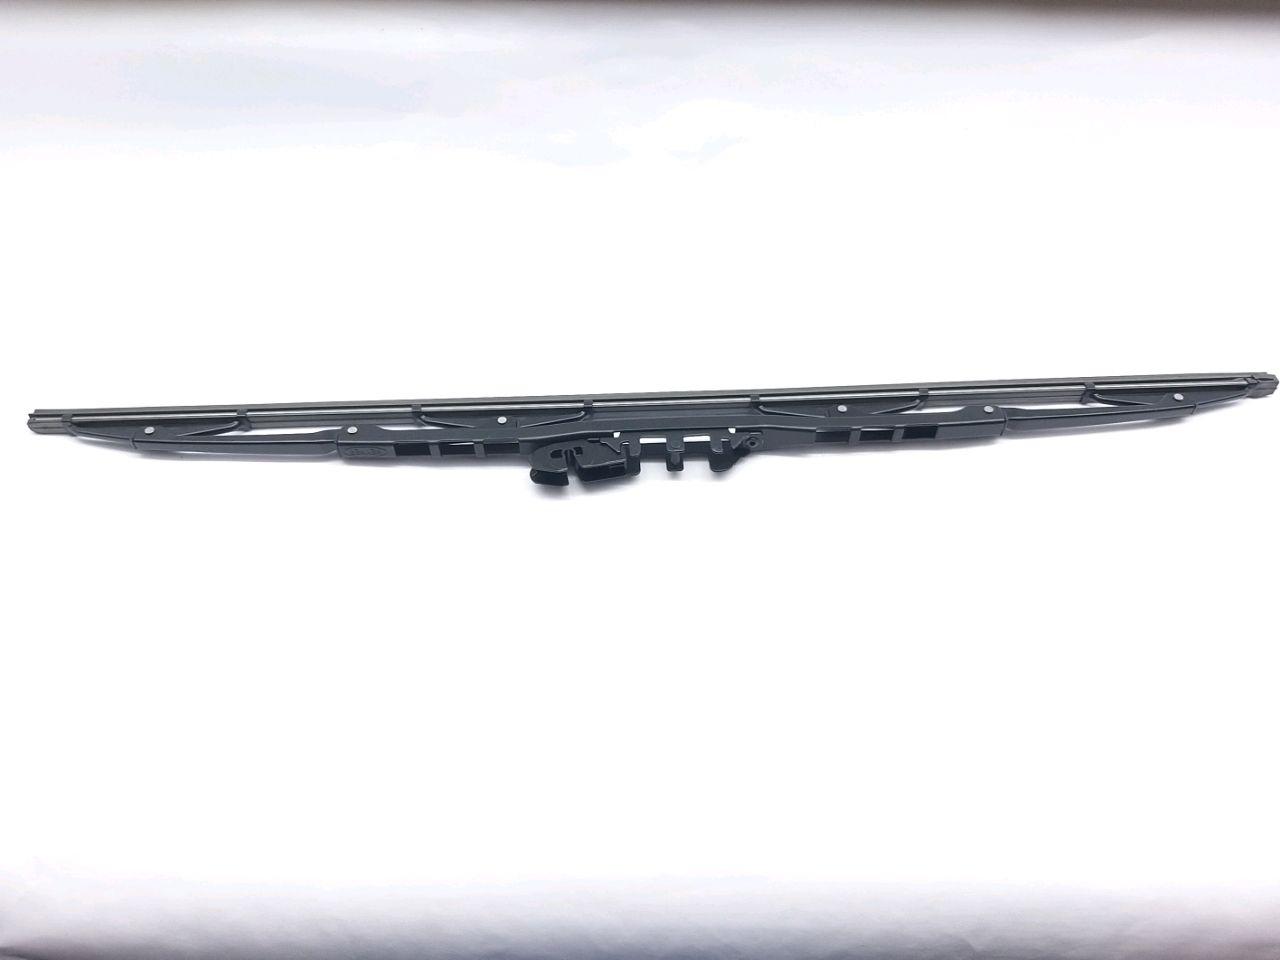 Perie stergatoare p/parbriz 65cm HEYNER Hybrid